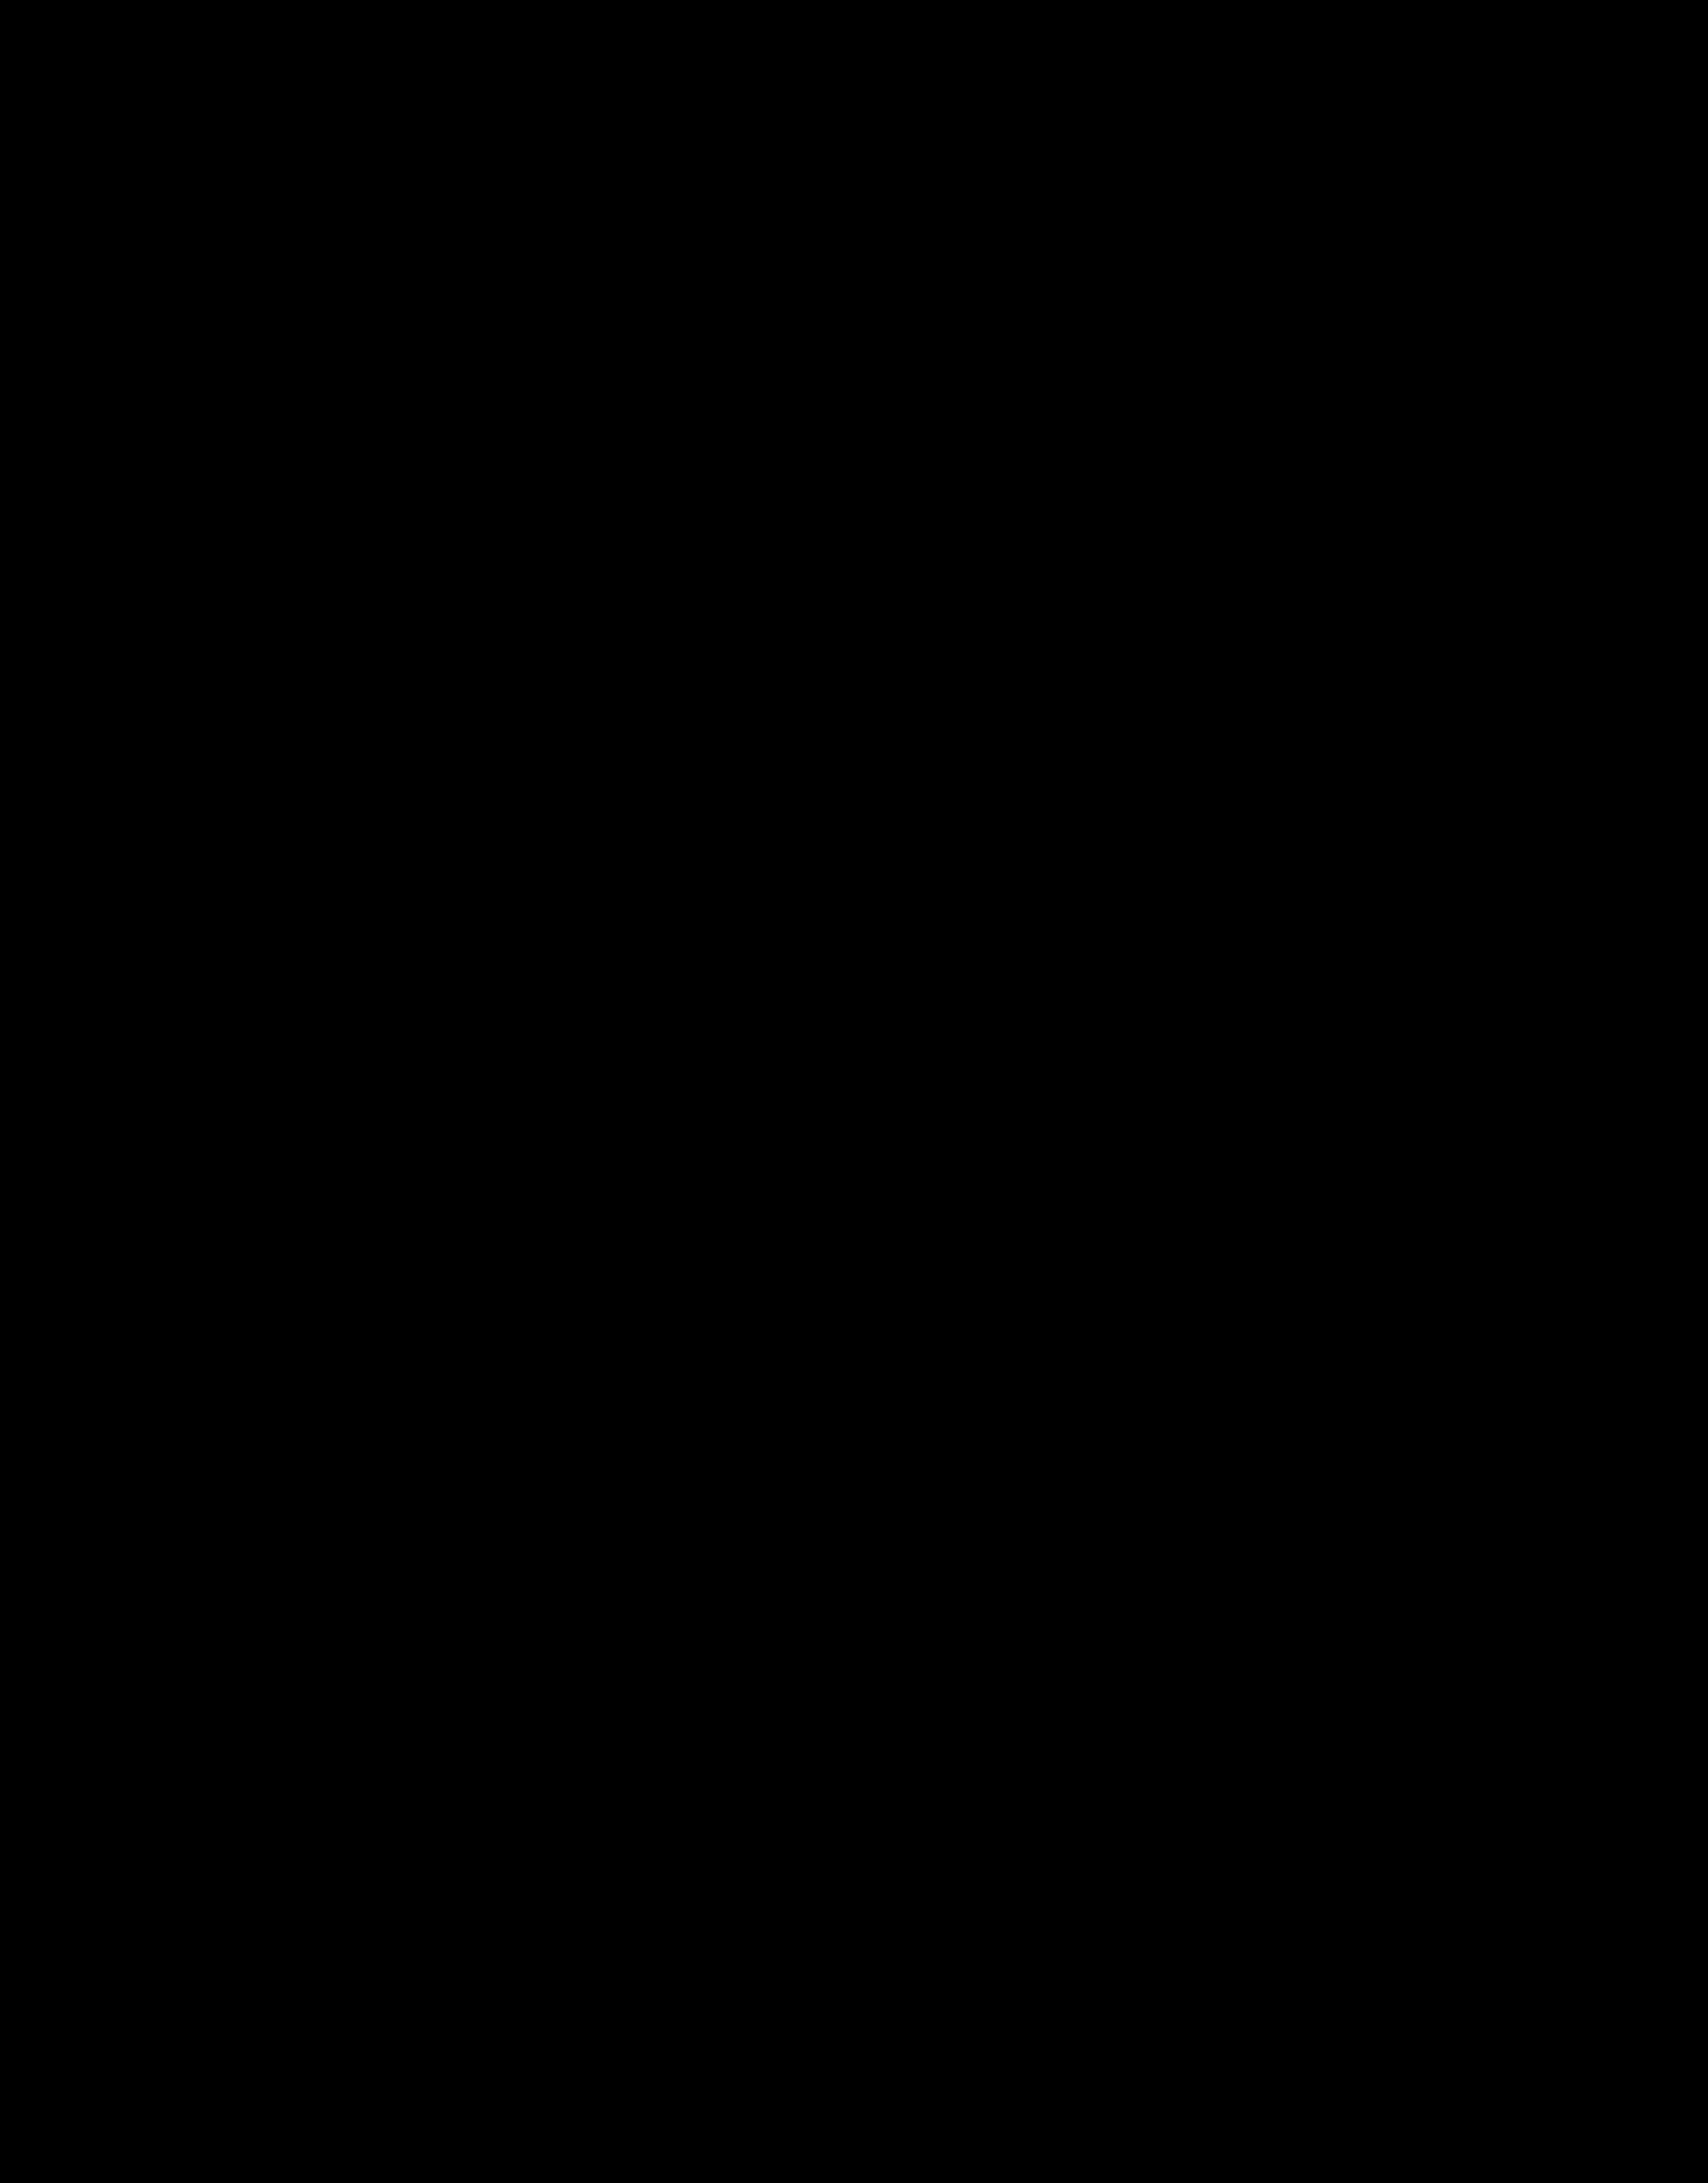 memory game icon 0iJZ1